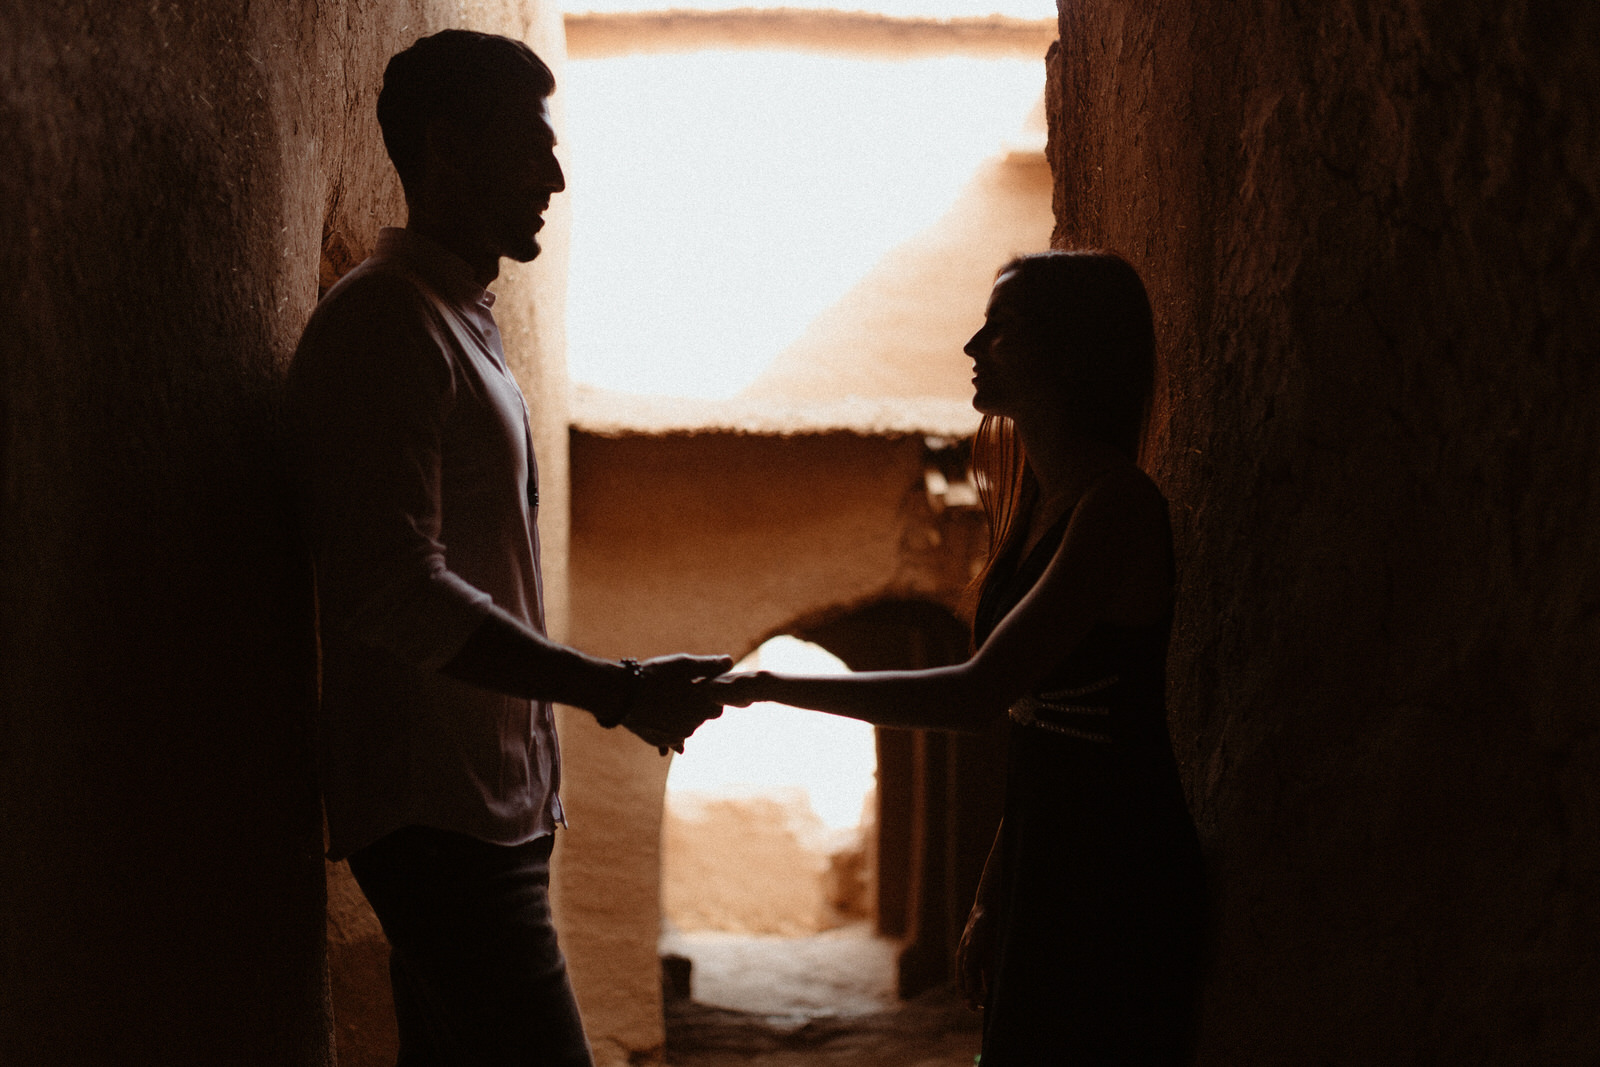 cinematic-couples-shoot-light-analyst-alternative